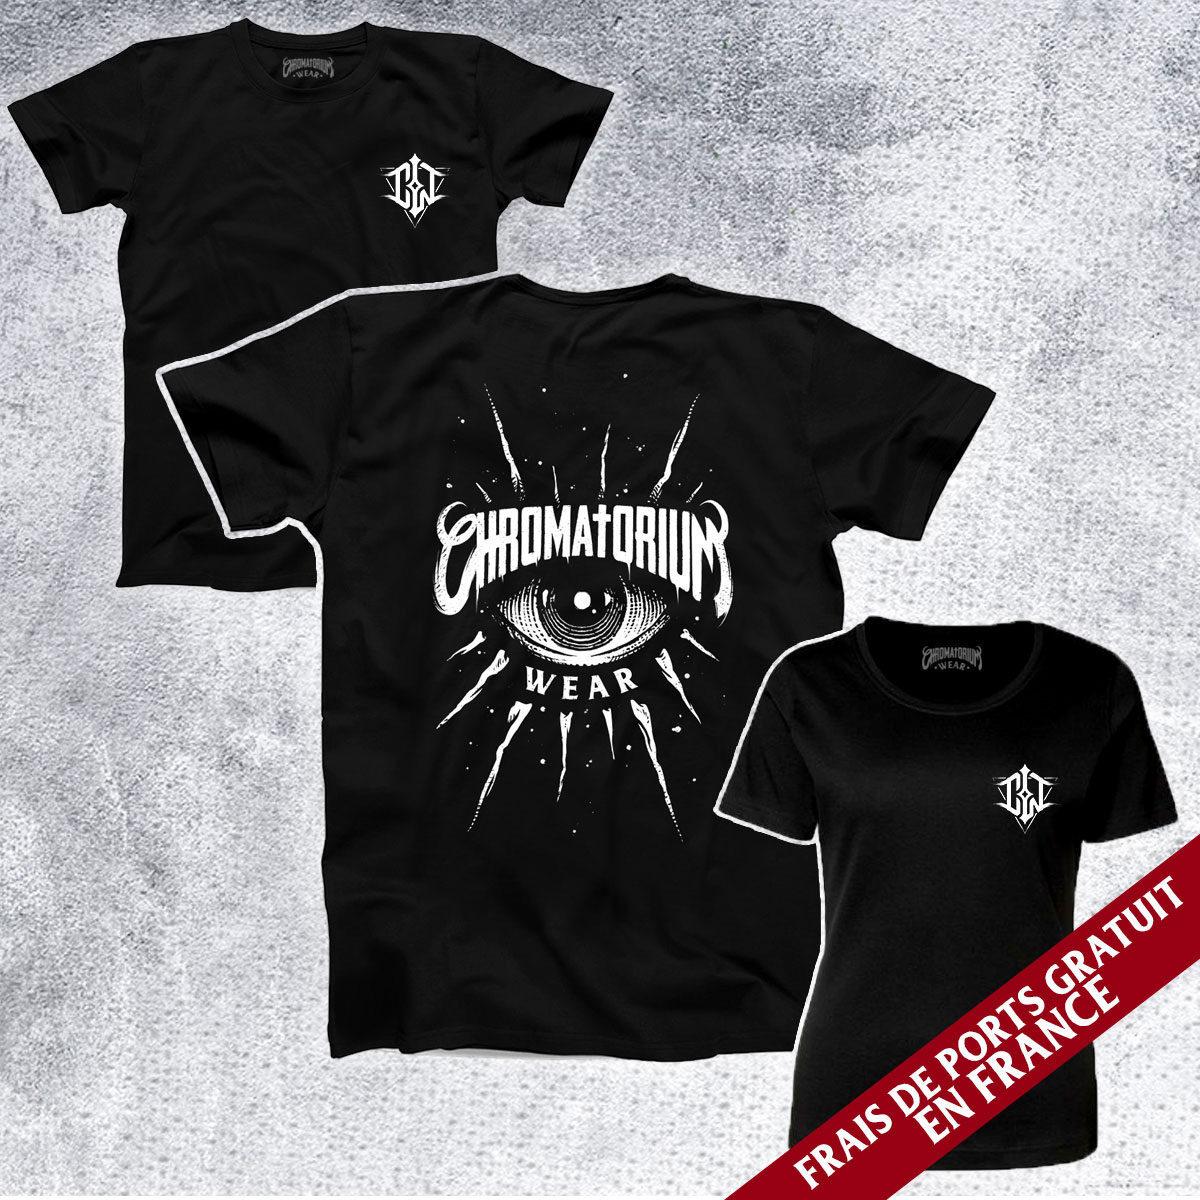 t-shirt noir avec impression sérigraphie oeil eye tattoo